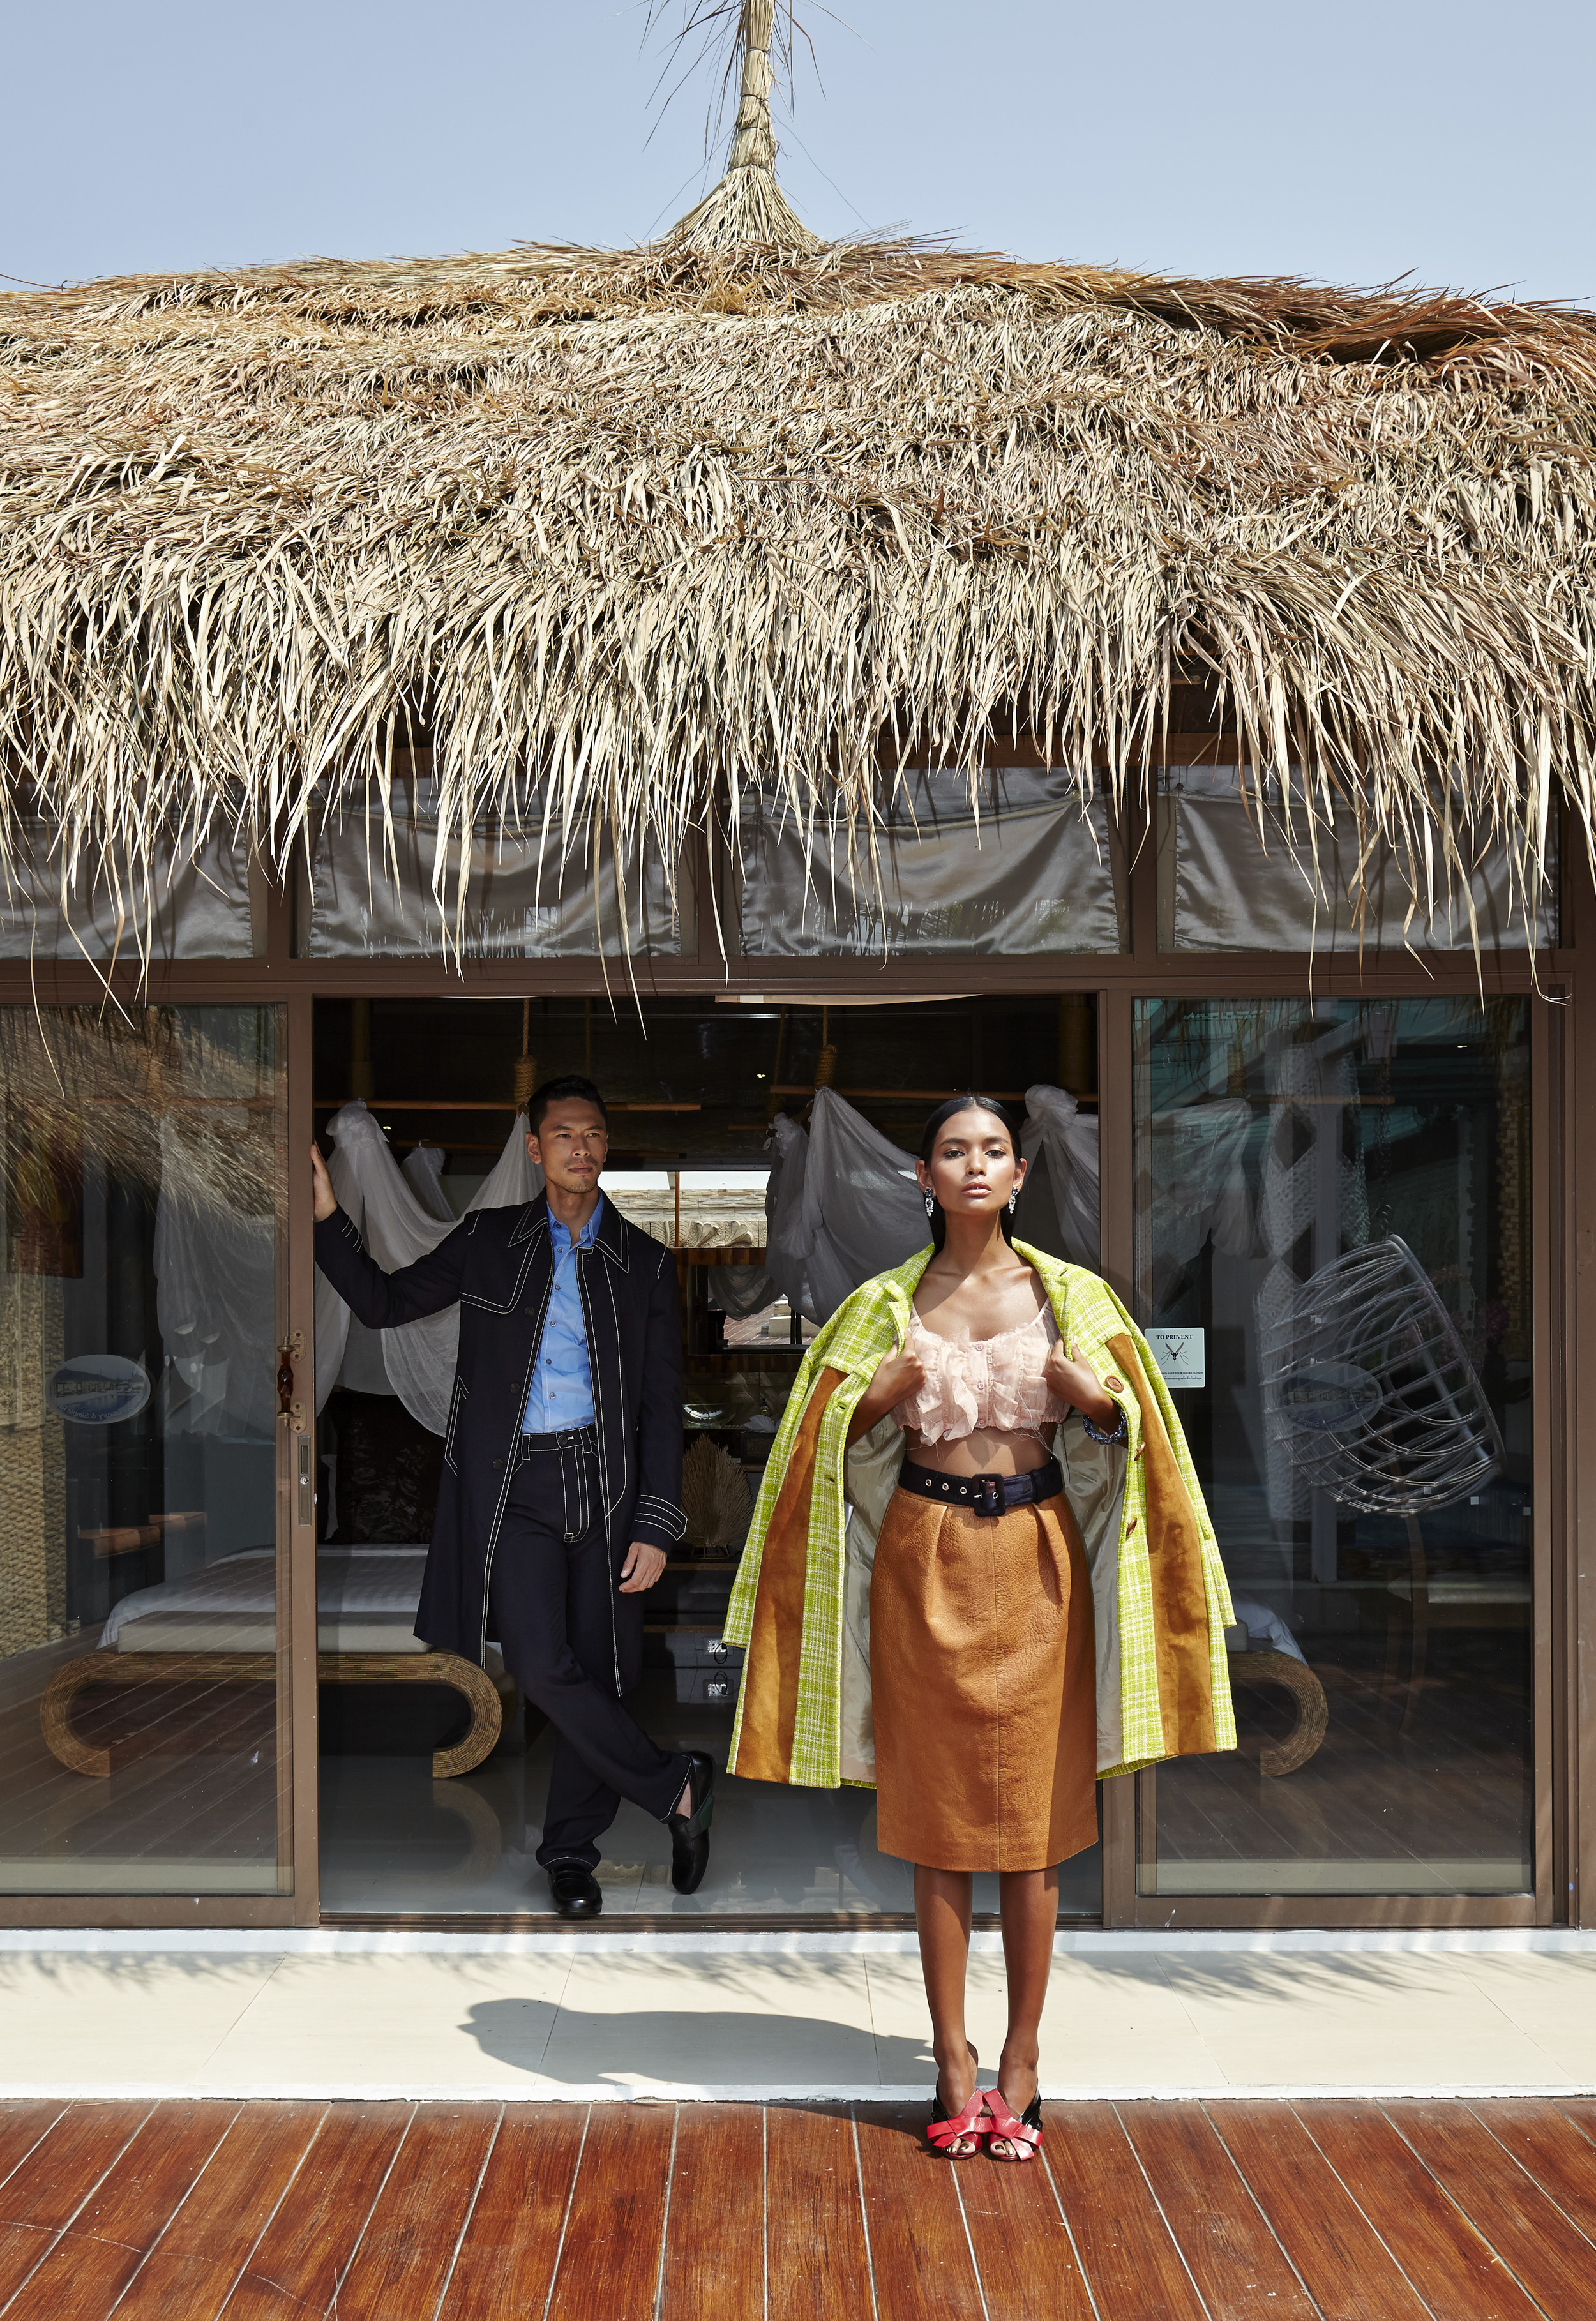 Female : clothes and shoes : MIU MIU / accessories : PRADA  Male :clothes and shoes : PRADA